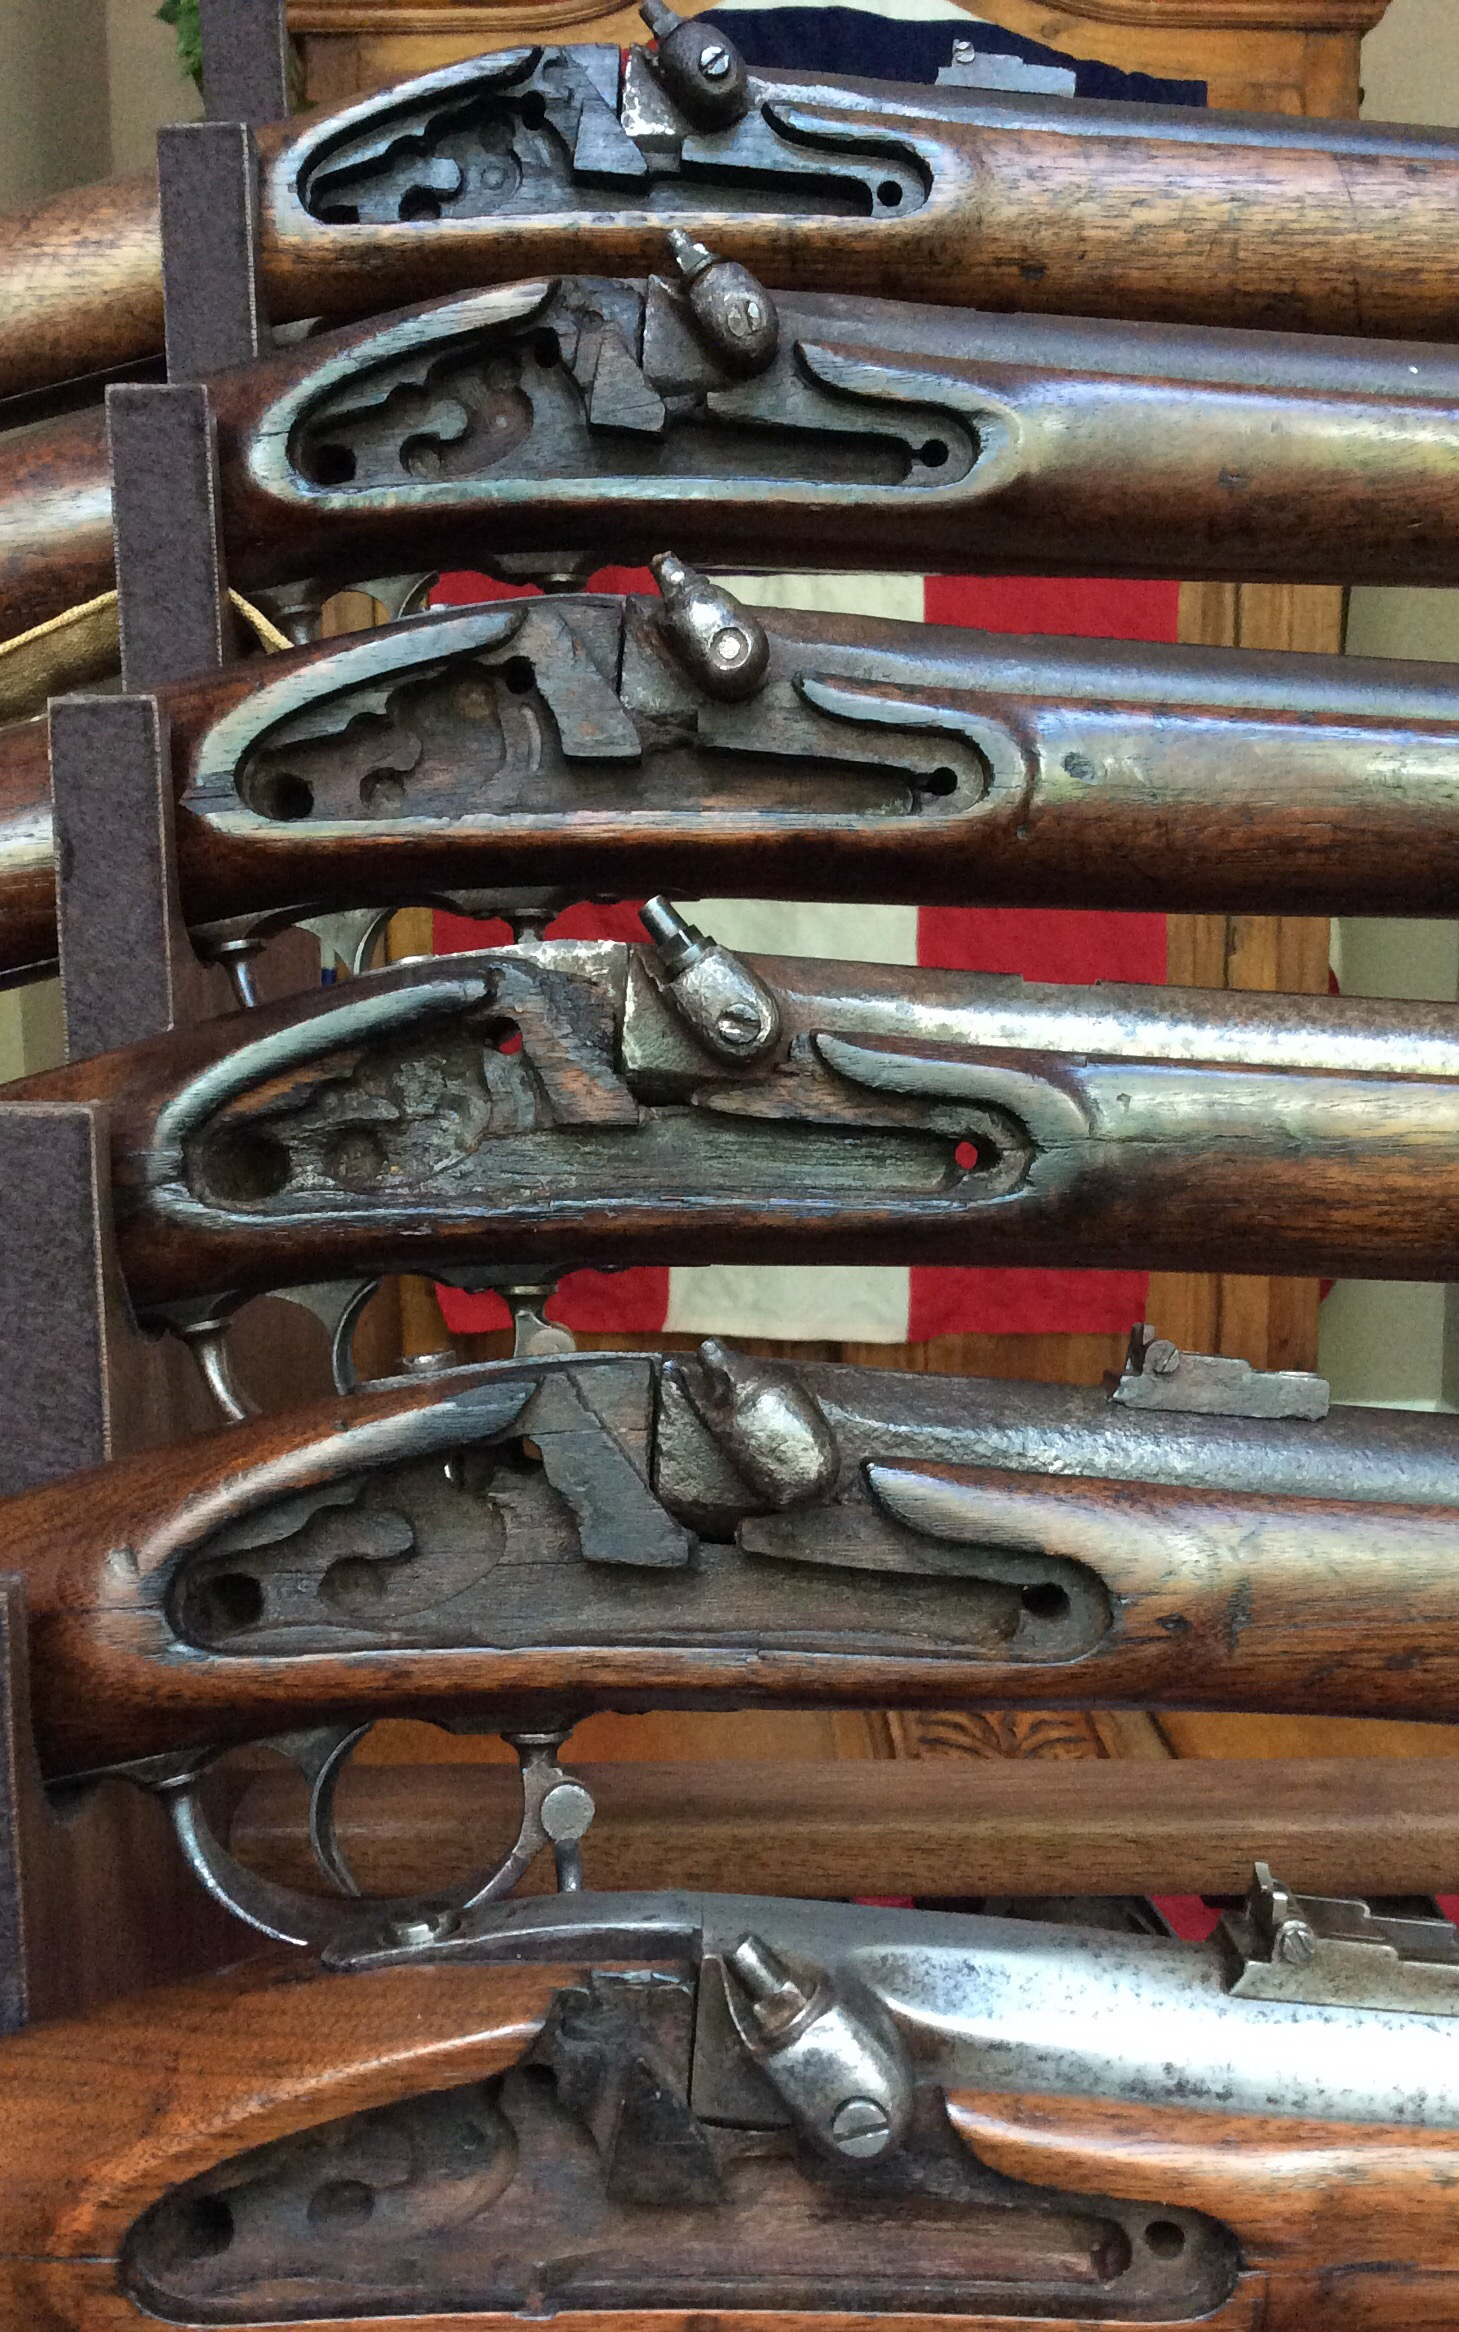 Richmond Carbines and Rifles, Lock Cavity